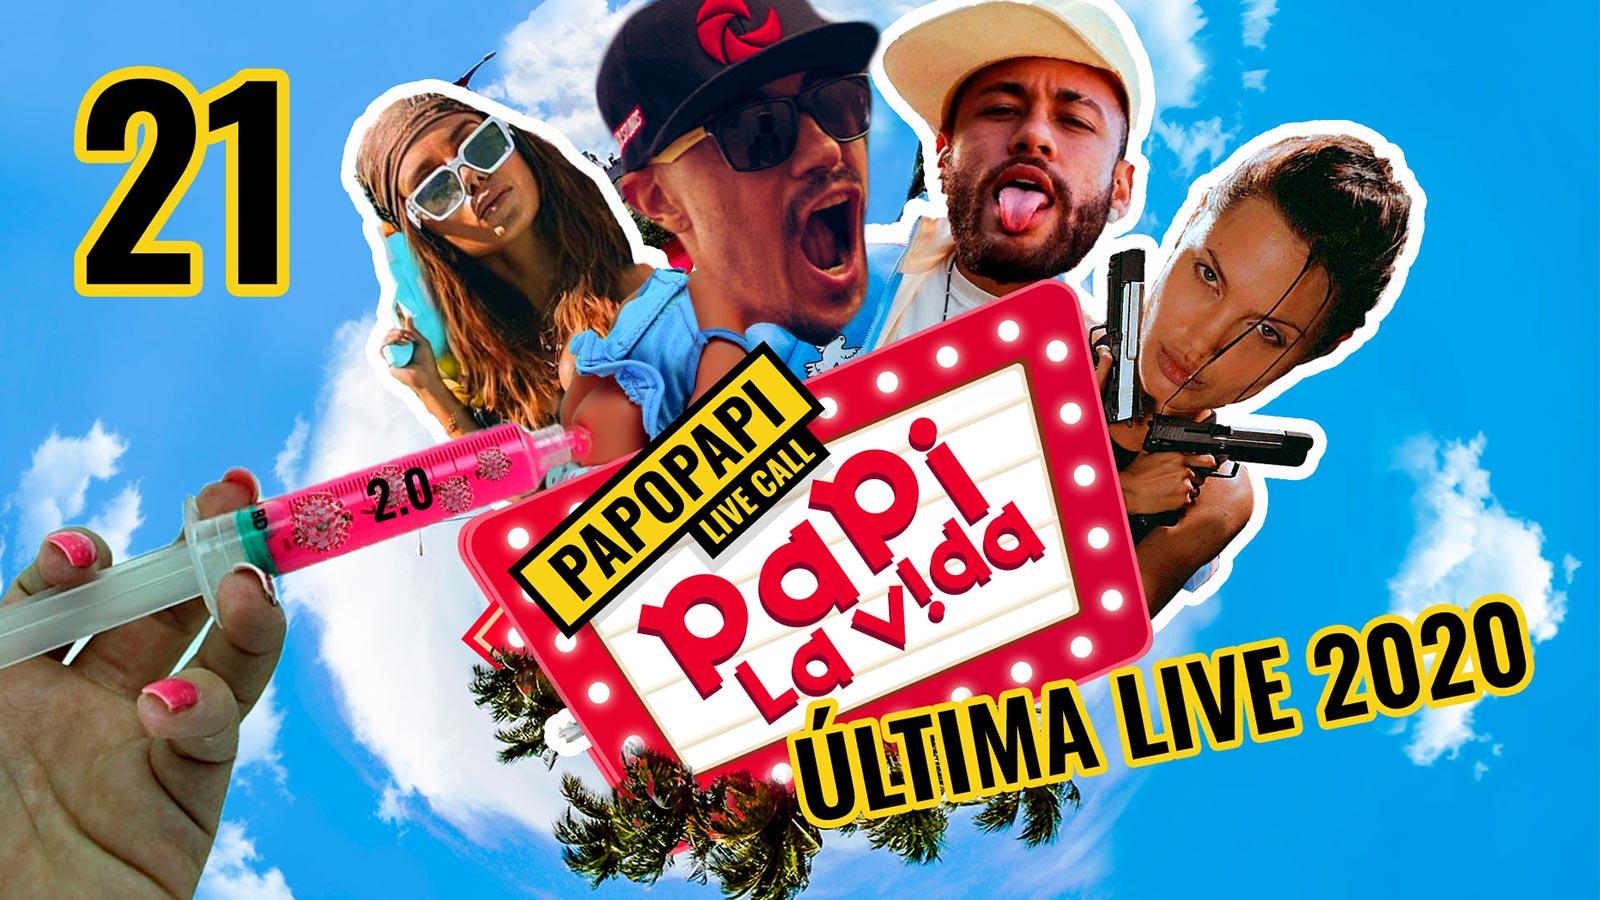 Ultima Live 2020: Vacina, Neymar, Anitta, Femicidio e Alienigenas